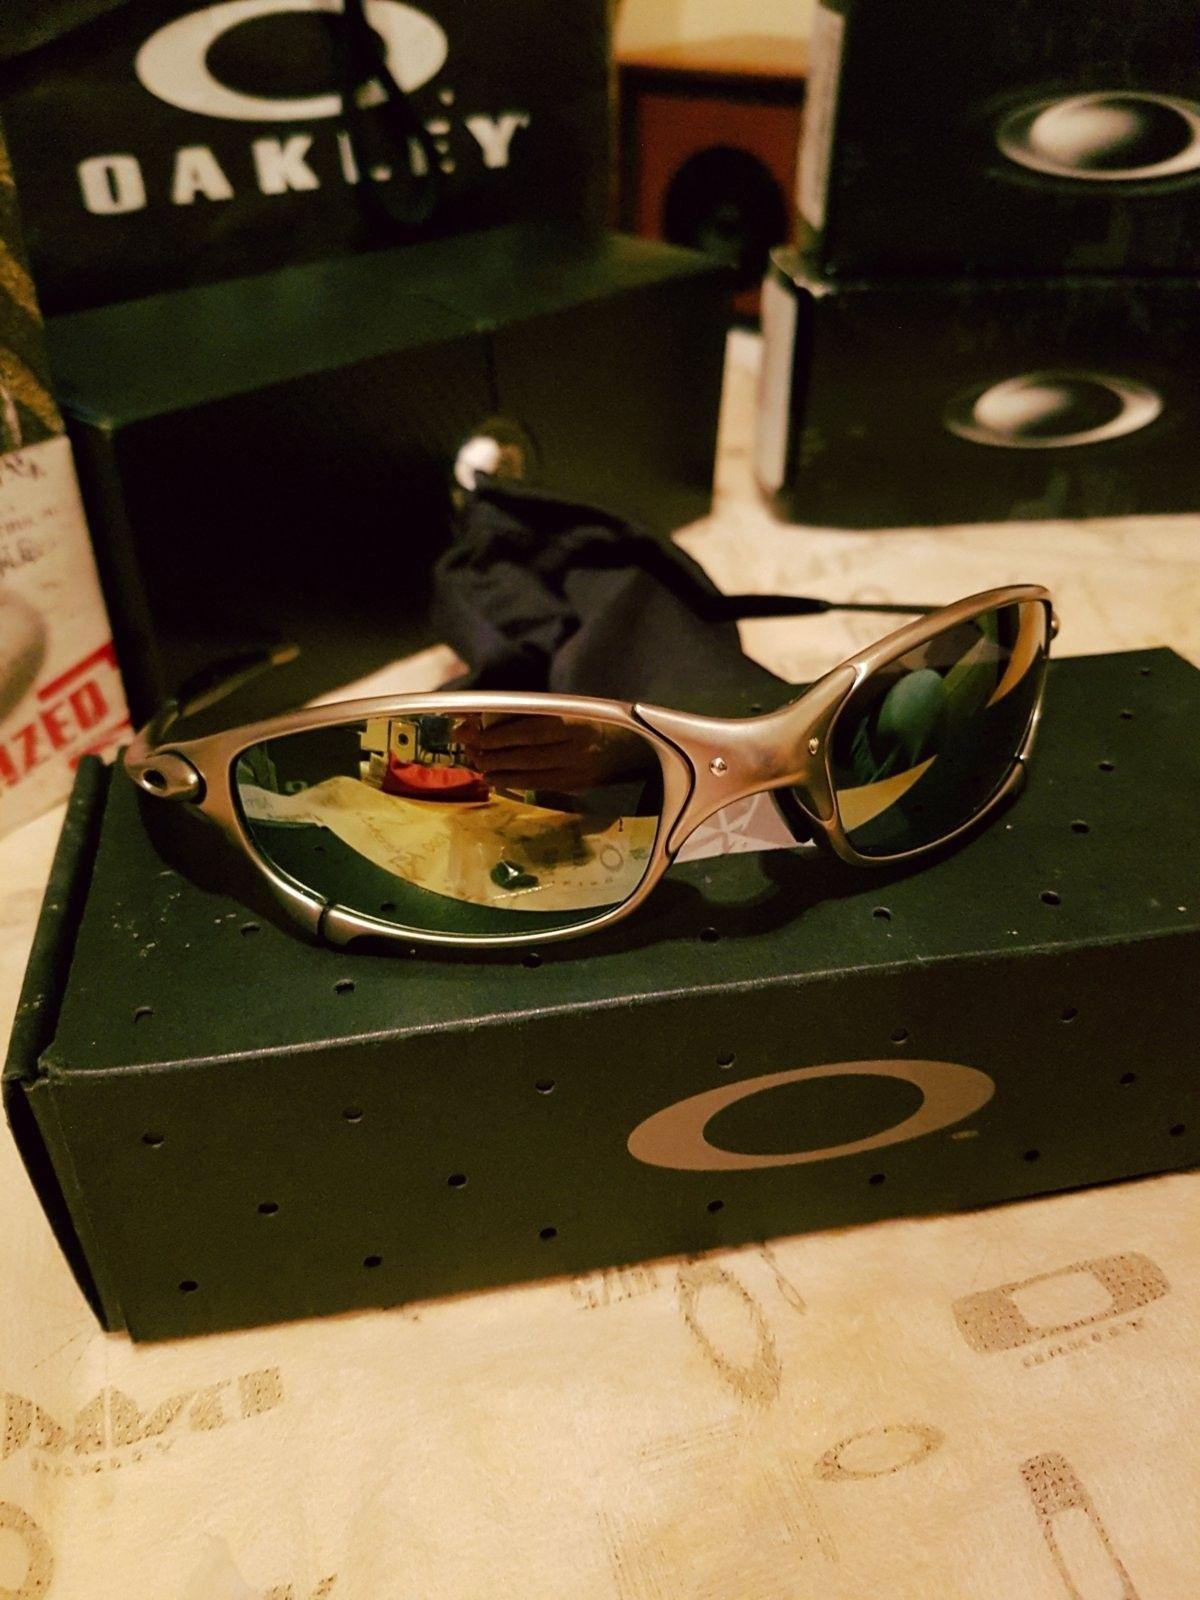 juliet plasma emerald 04-115 - 20160713_024940.jpg